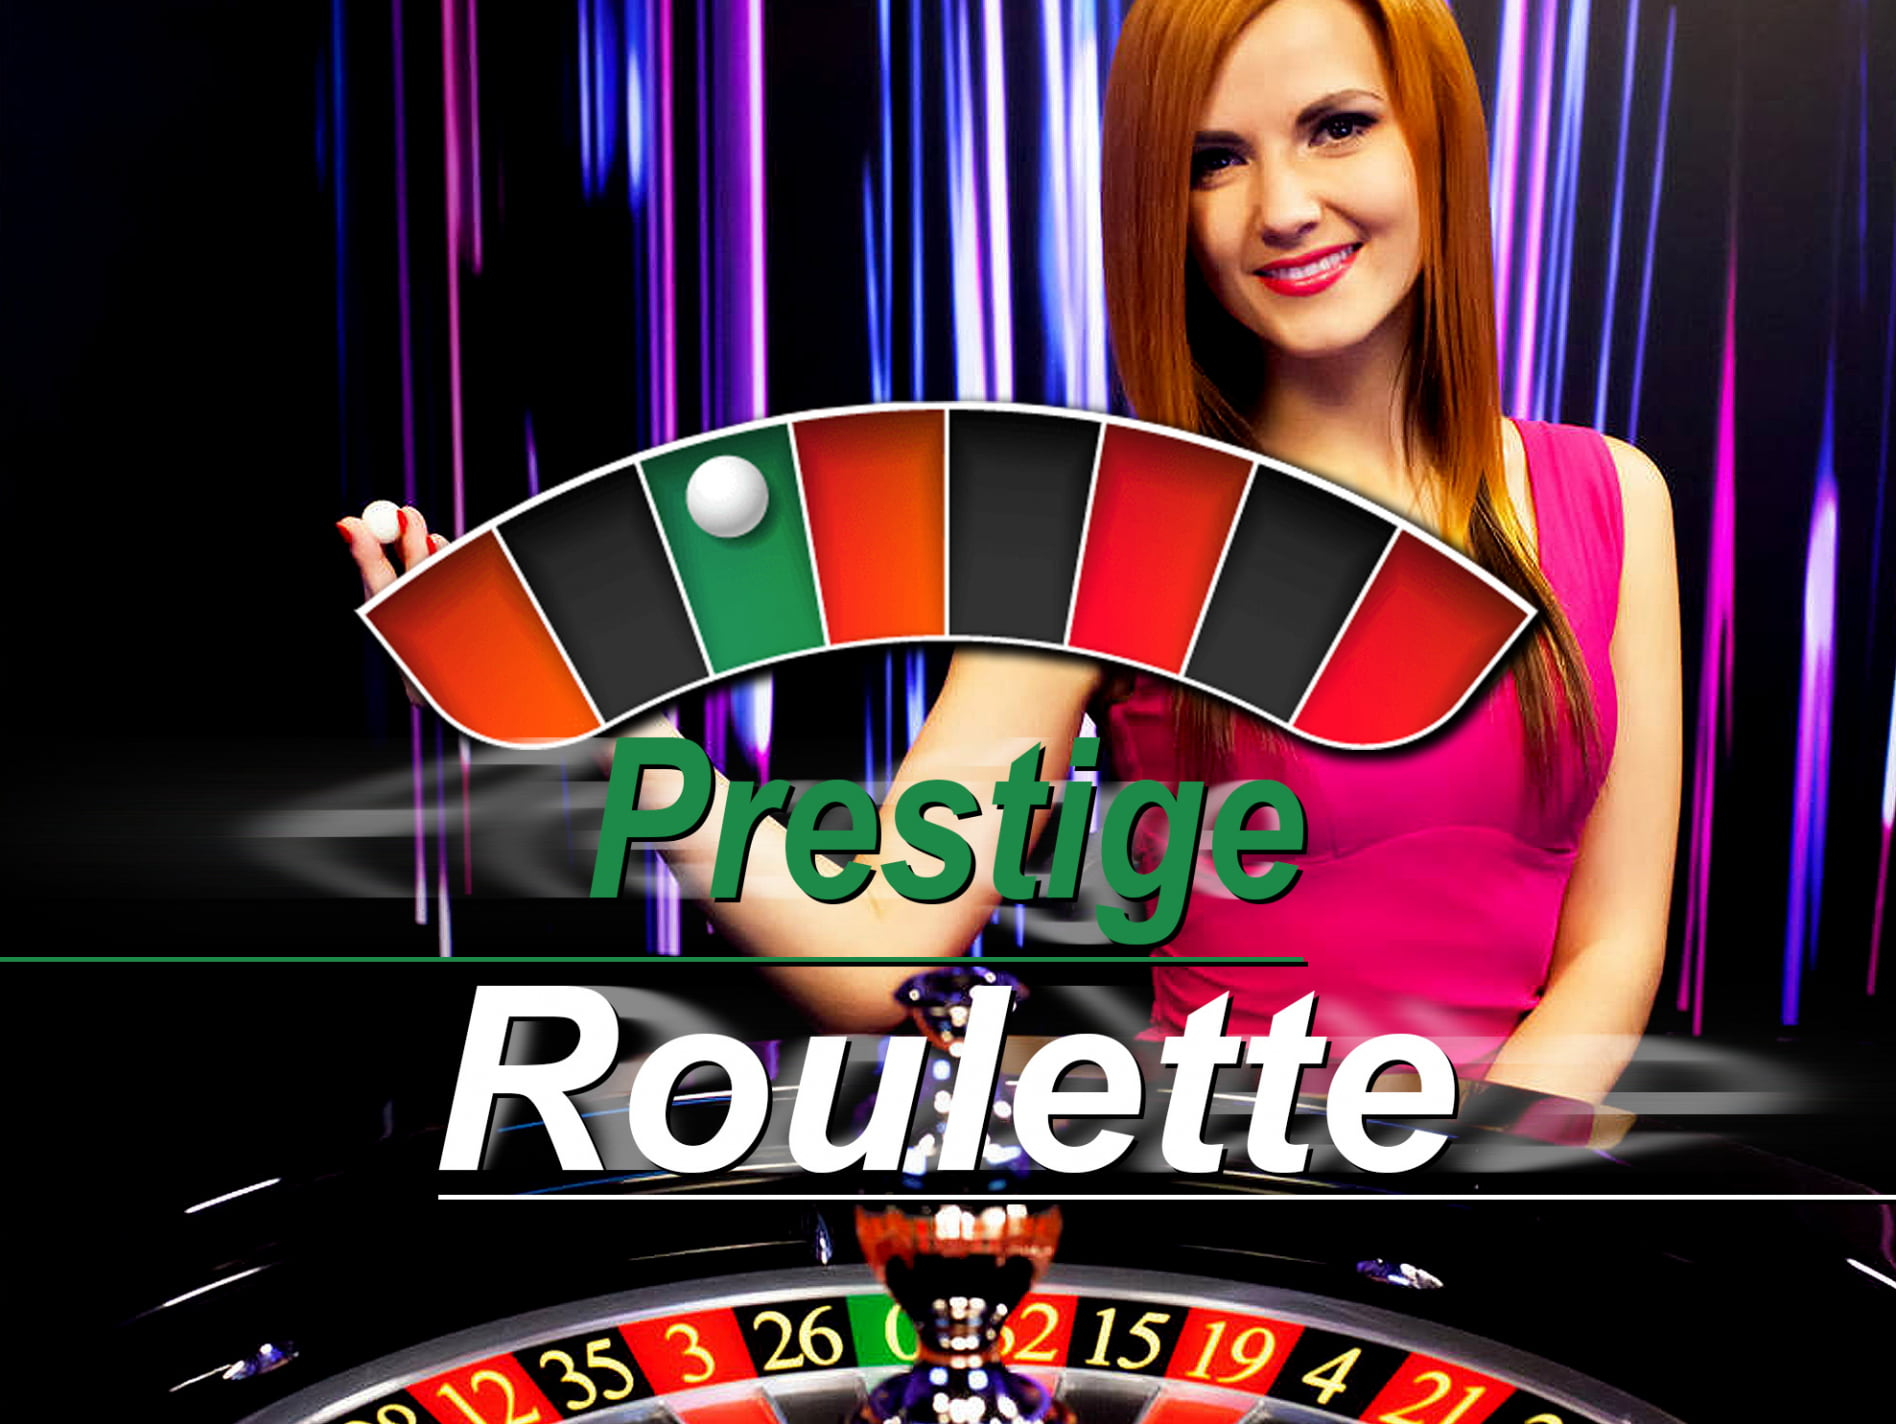 Como ganar un iphone gratis ruleta Móvil Portugal-488725